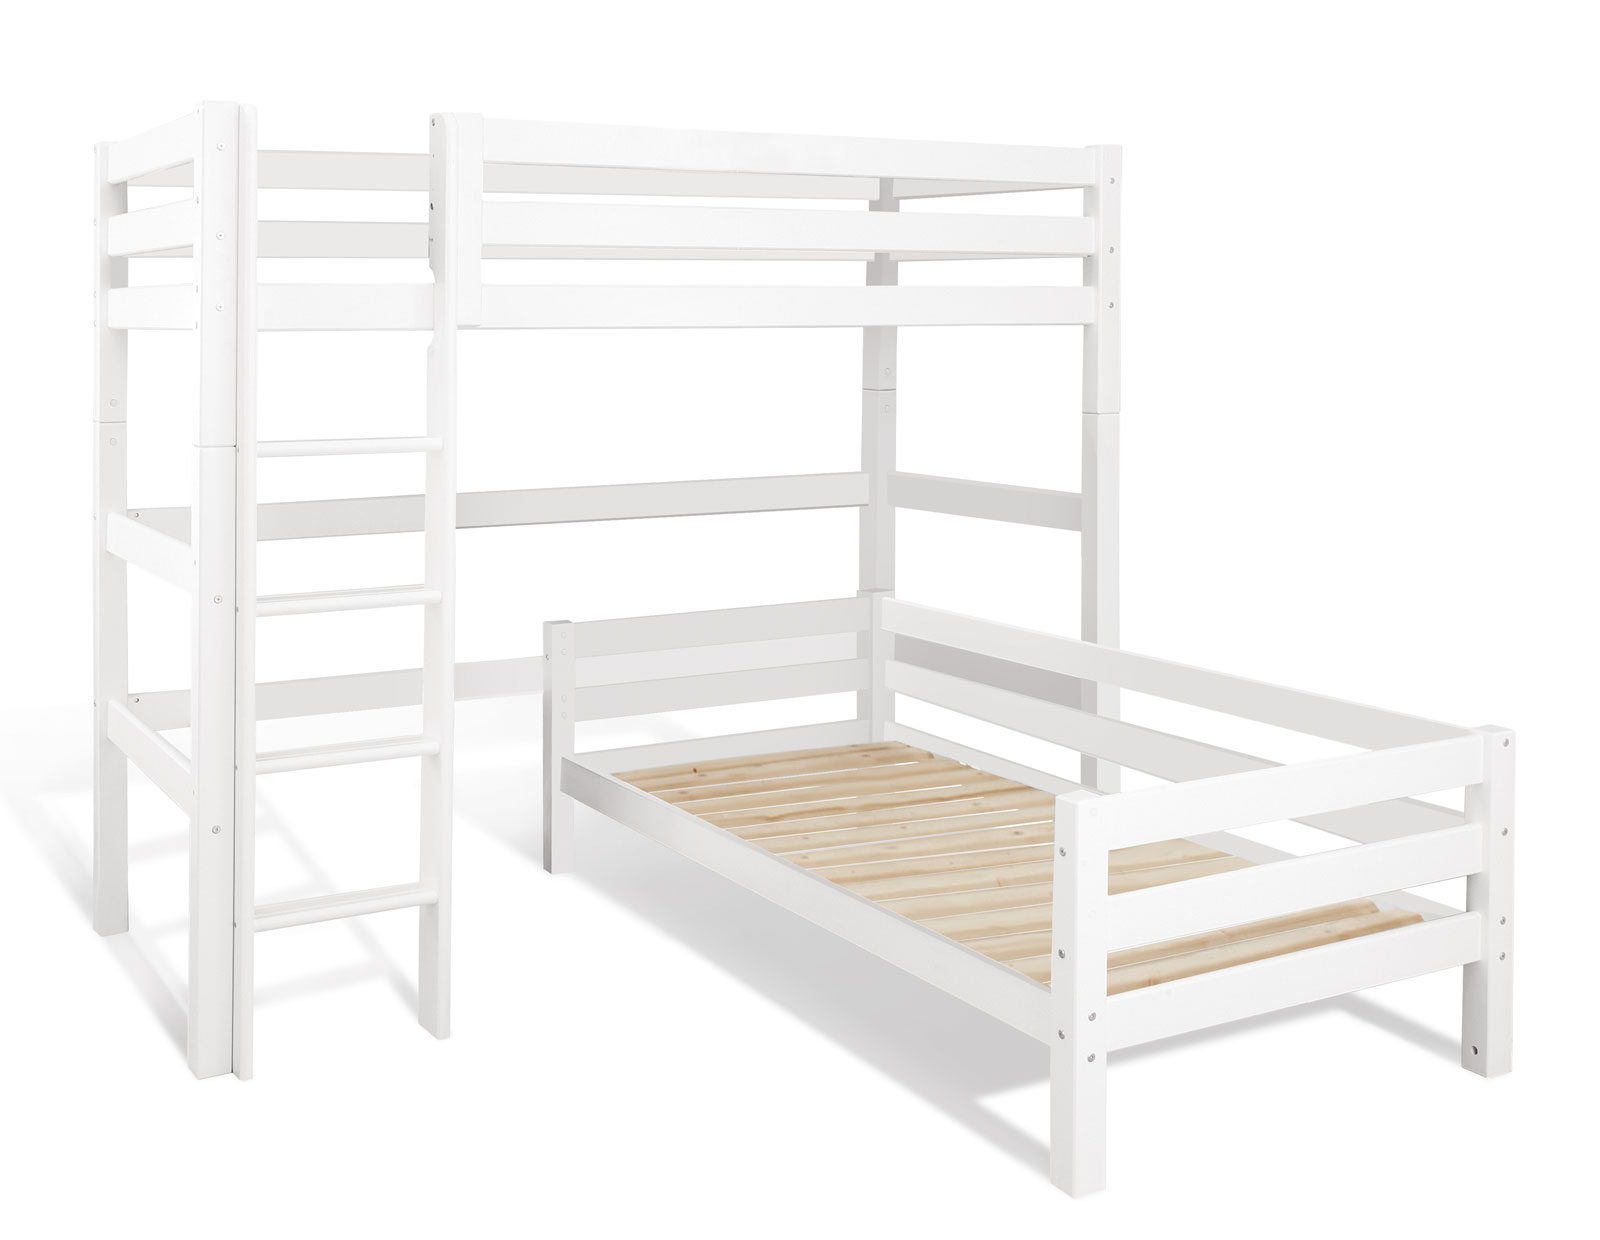 Etagenbett Mit Lattenrost Günstig : Eck etagenbett in weiß aus massivem kiefernholz kids royalty